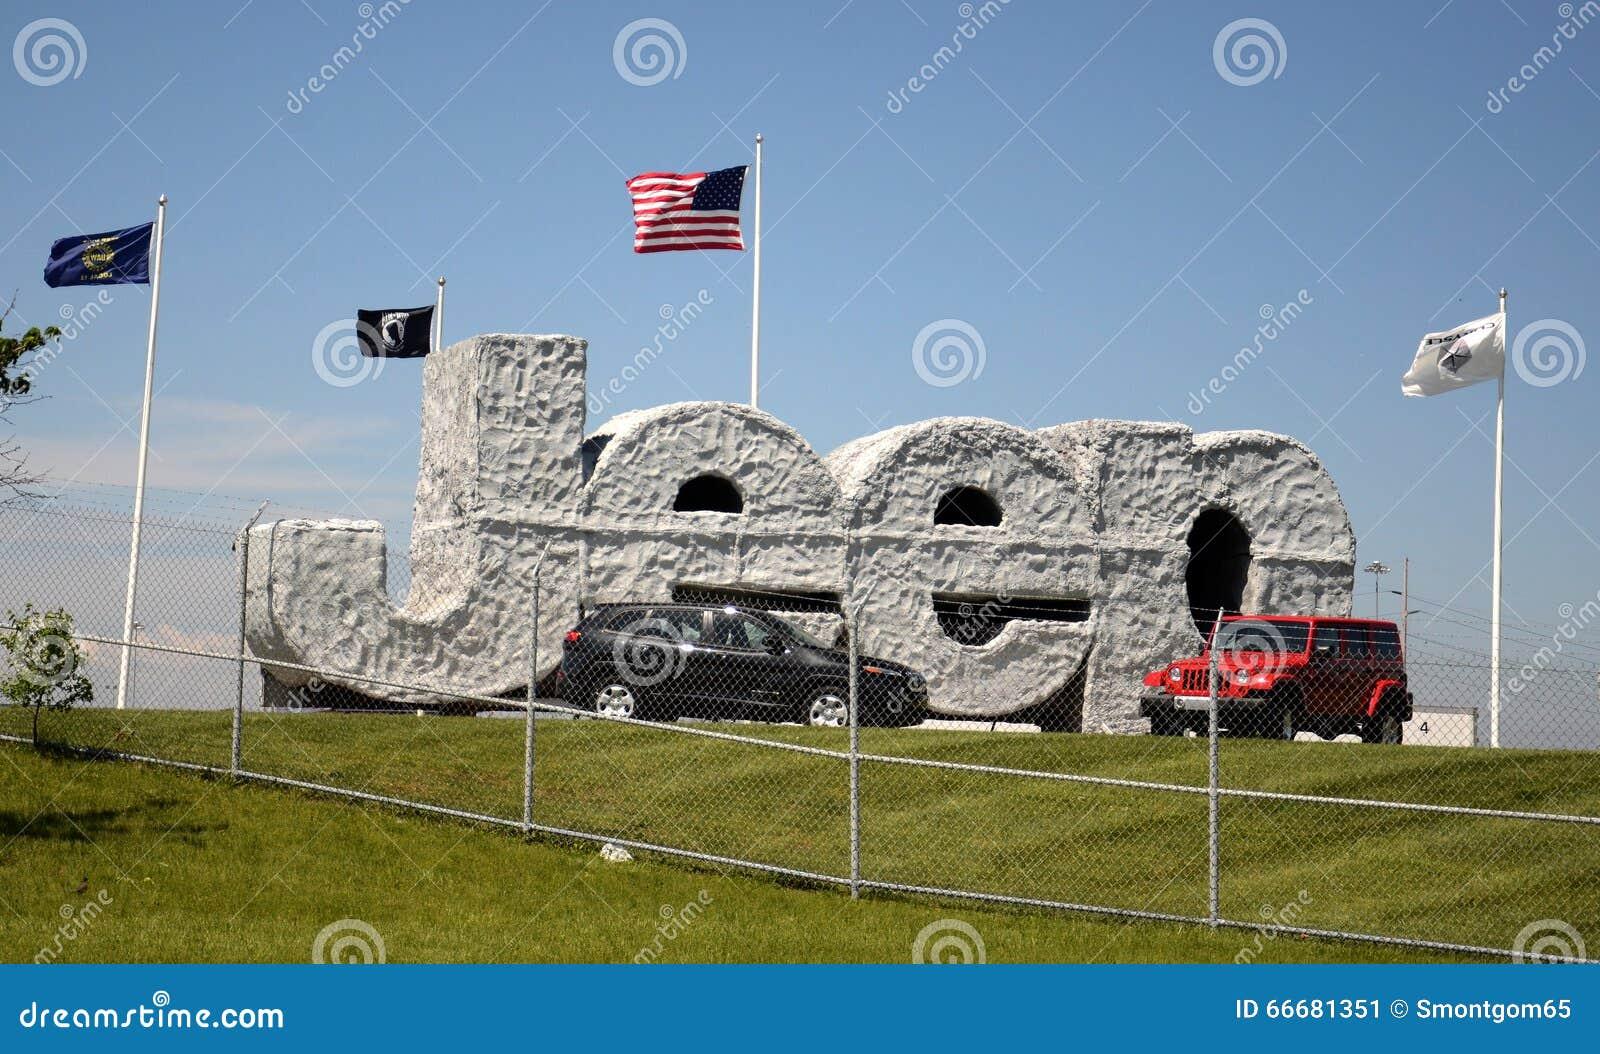 toledo chrysler assembly plant jeep sgn editorial photo image 66681351. Black Bedroom Furniture Sets. Home Design Ideas